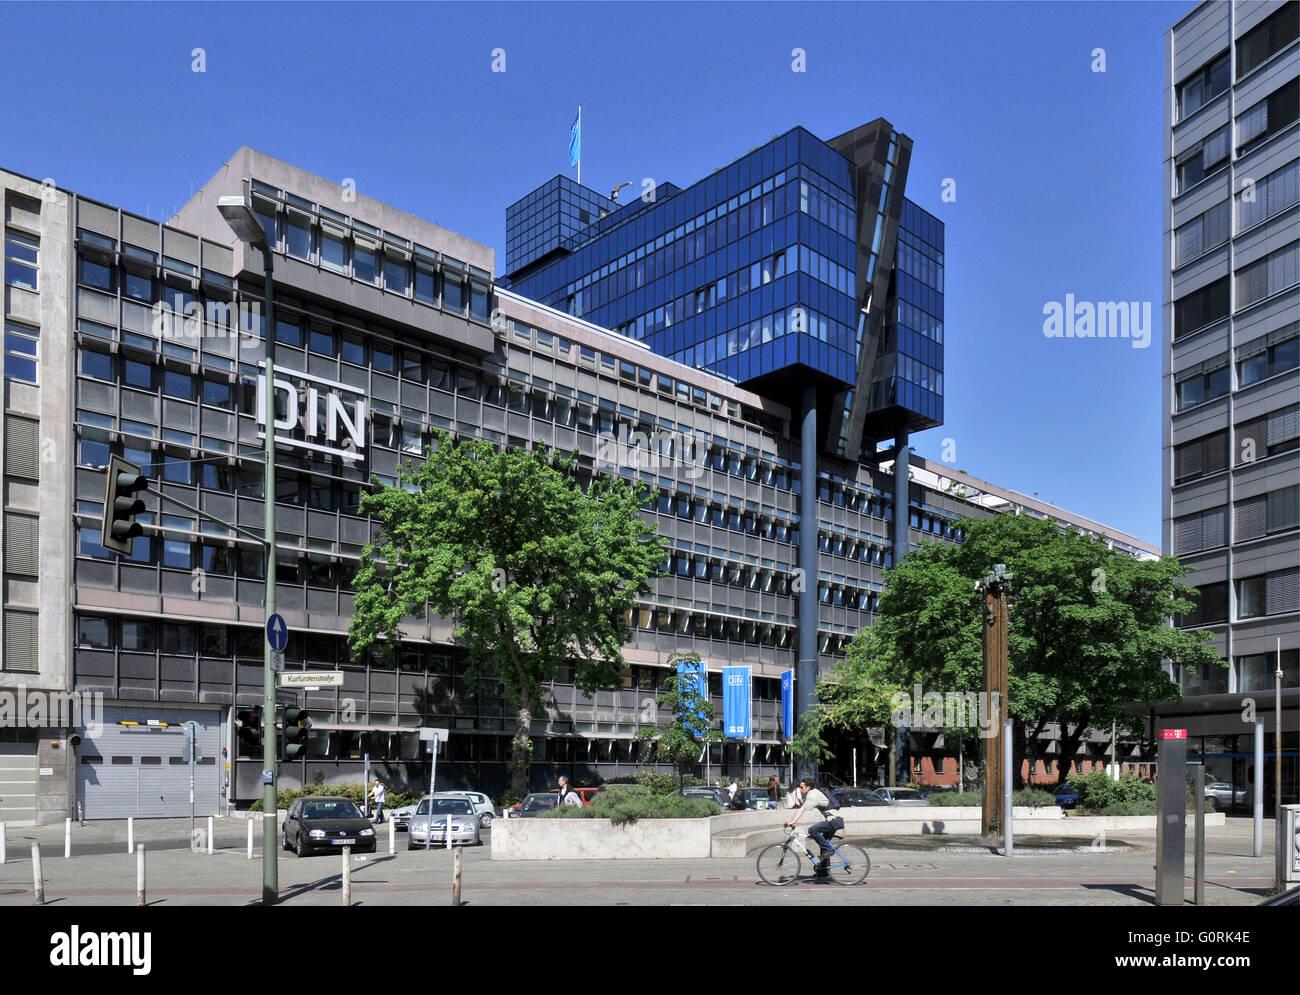 Deutsches Institut fur Normung, Burggrafenstrasse, Tiergarten, Berlin, Germany / DIN, Deutsches Institut f?r Normung, - Stock Image